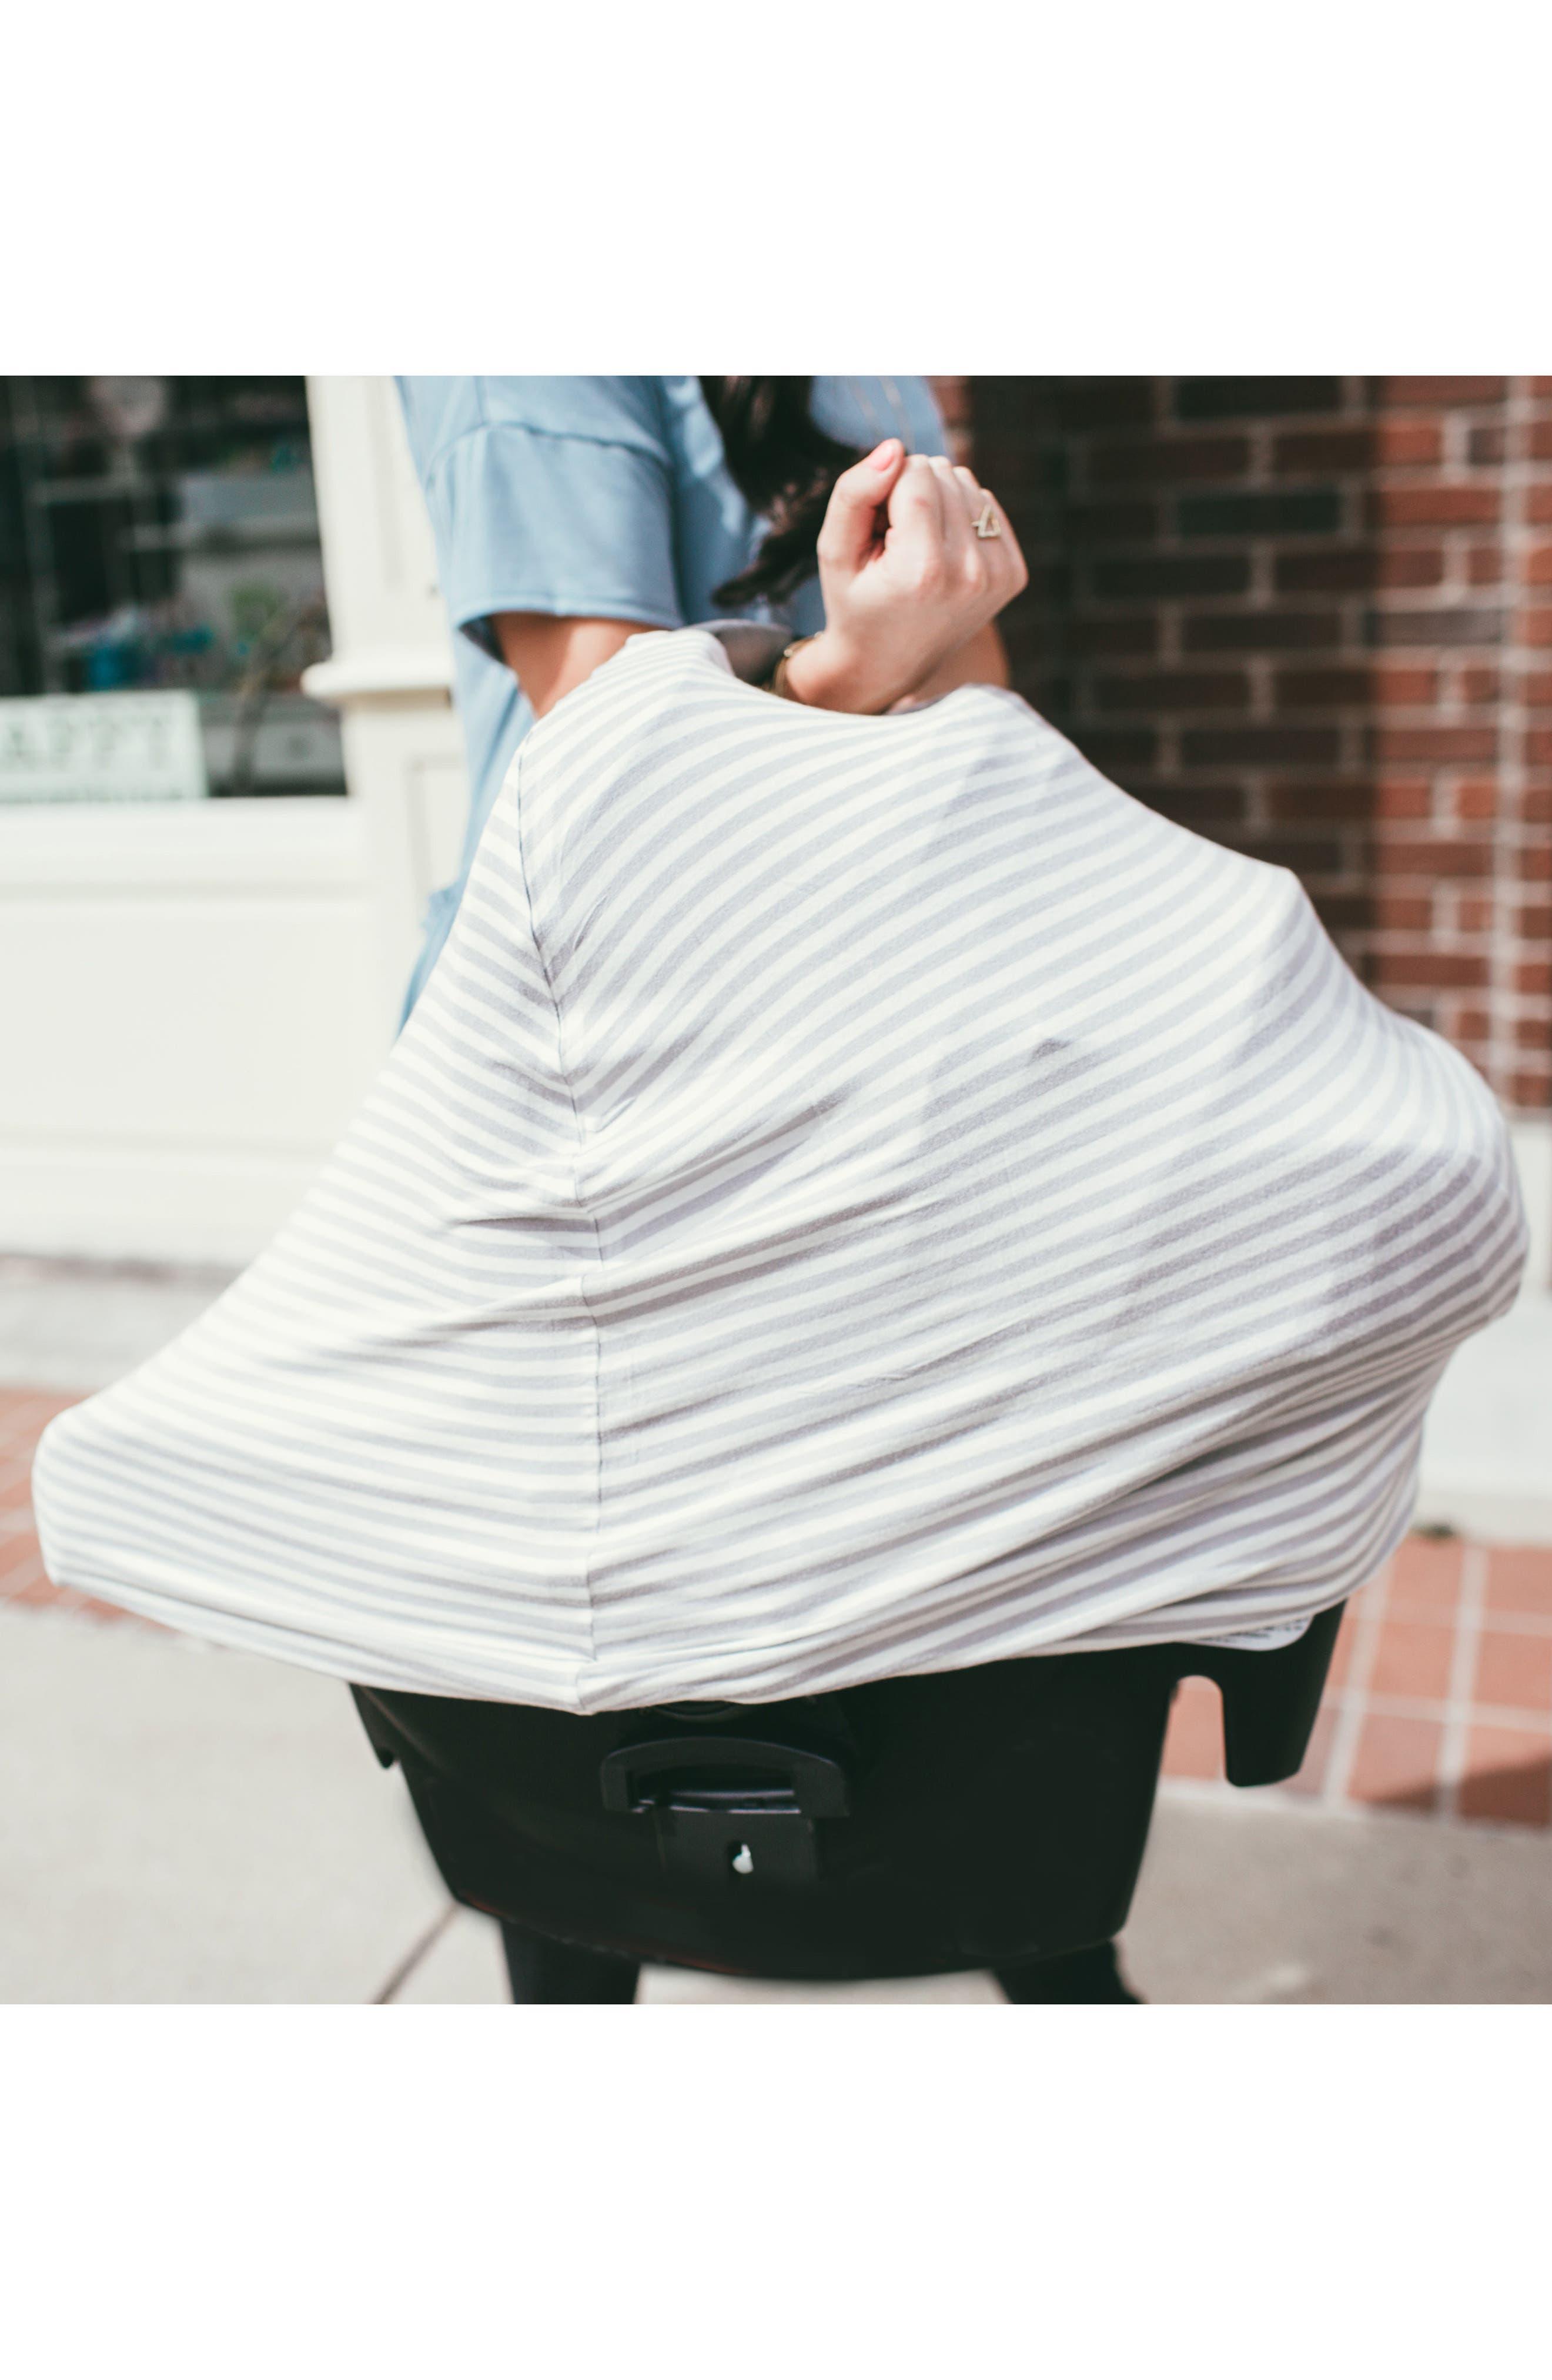 Summit Bib, Multiuse Cover & Swaddle Blanket Gift Set,                             Alternate thumbnail 27, color,                             Summit